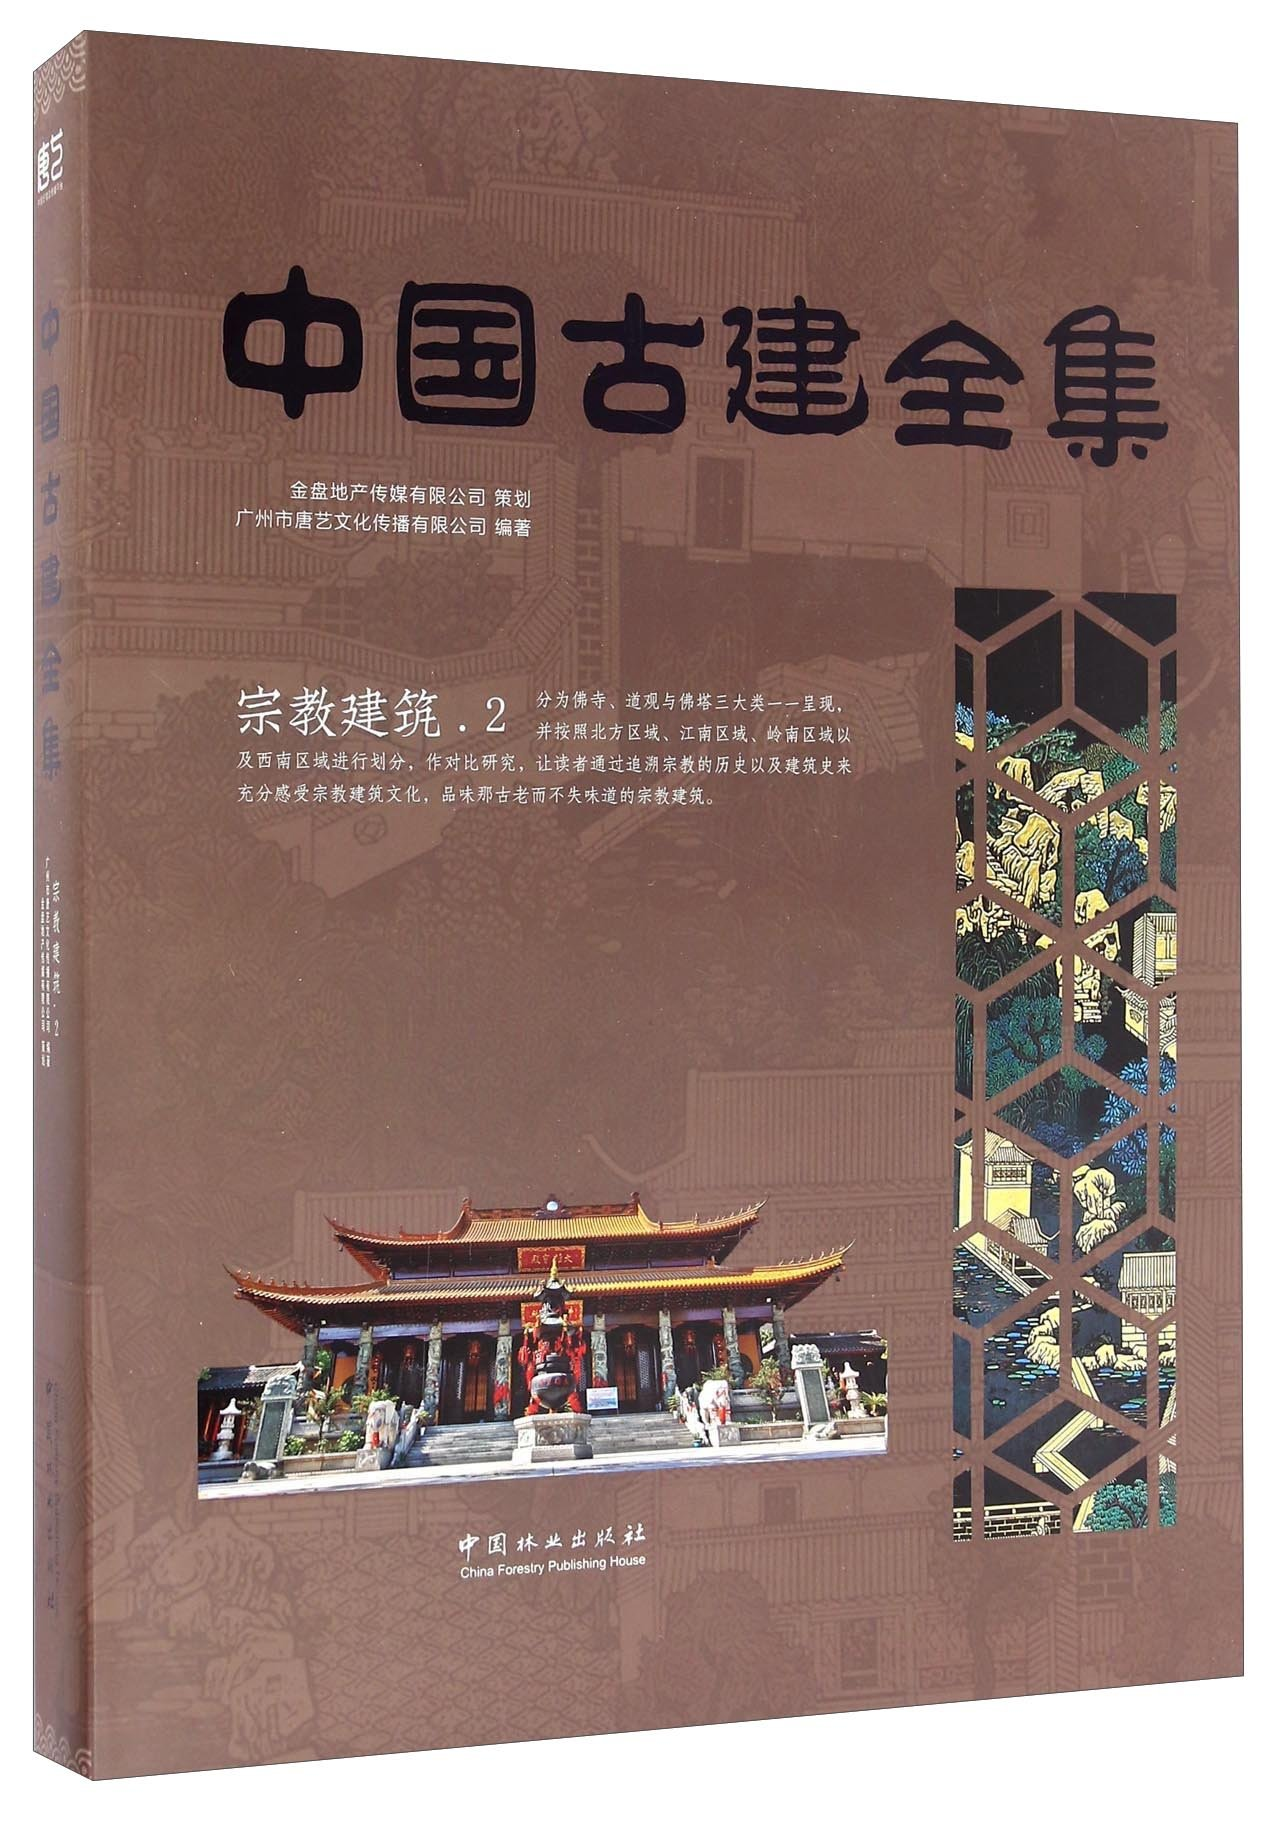 Download 宗教建筑(2)(精)/中国古建全集 PDF